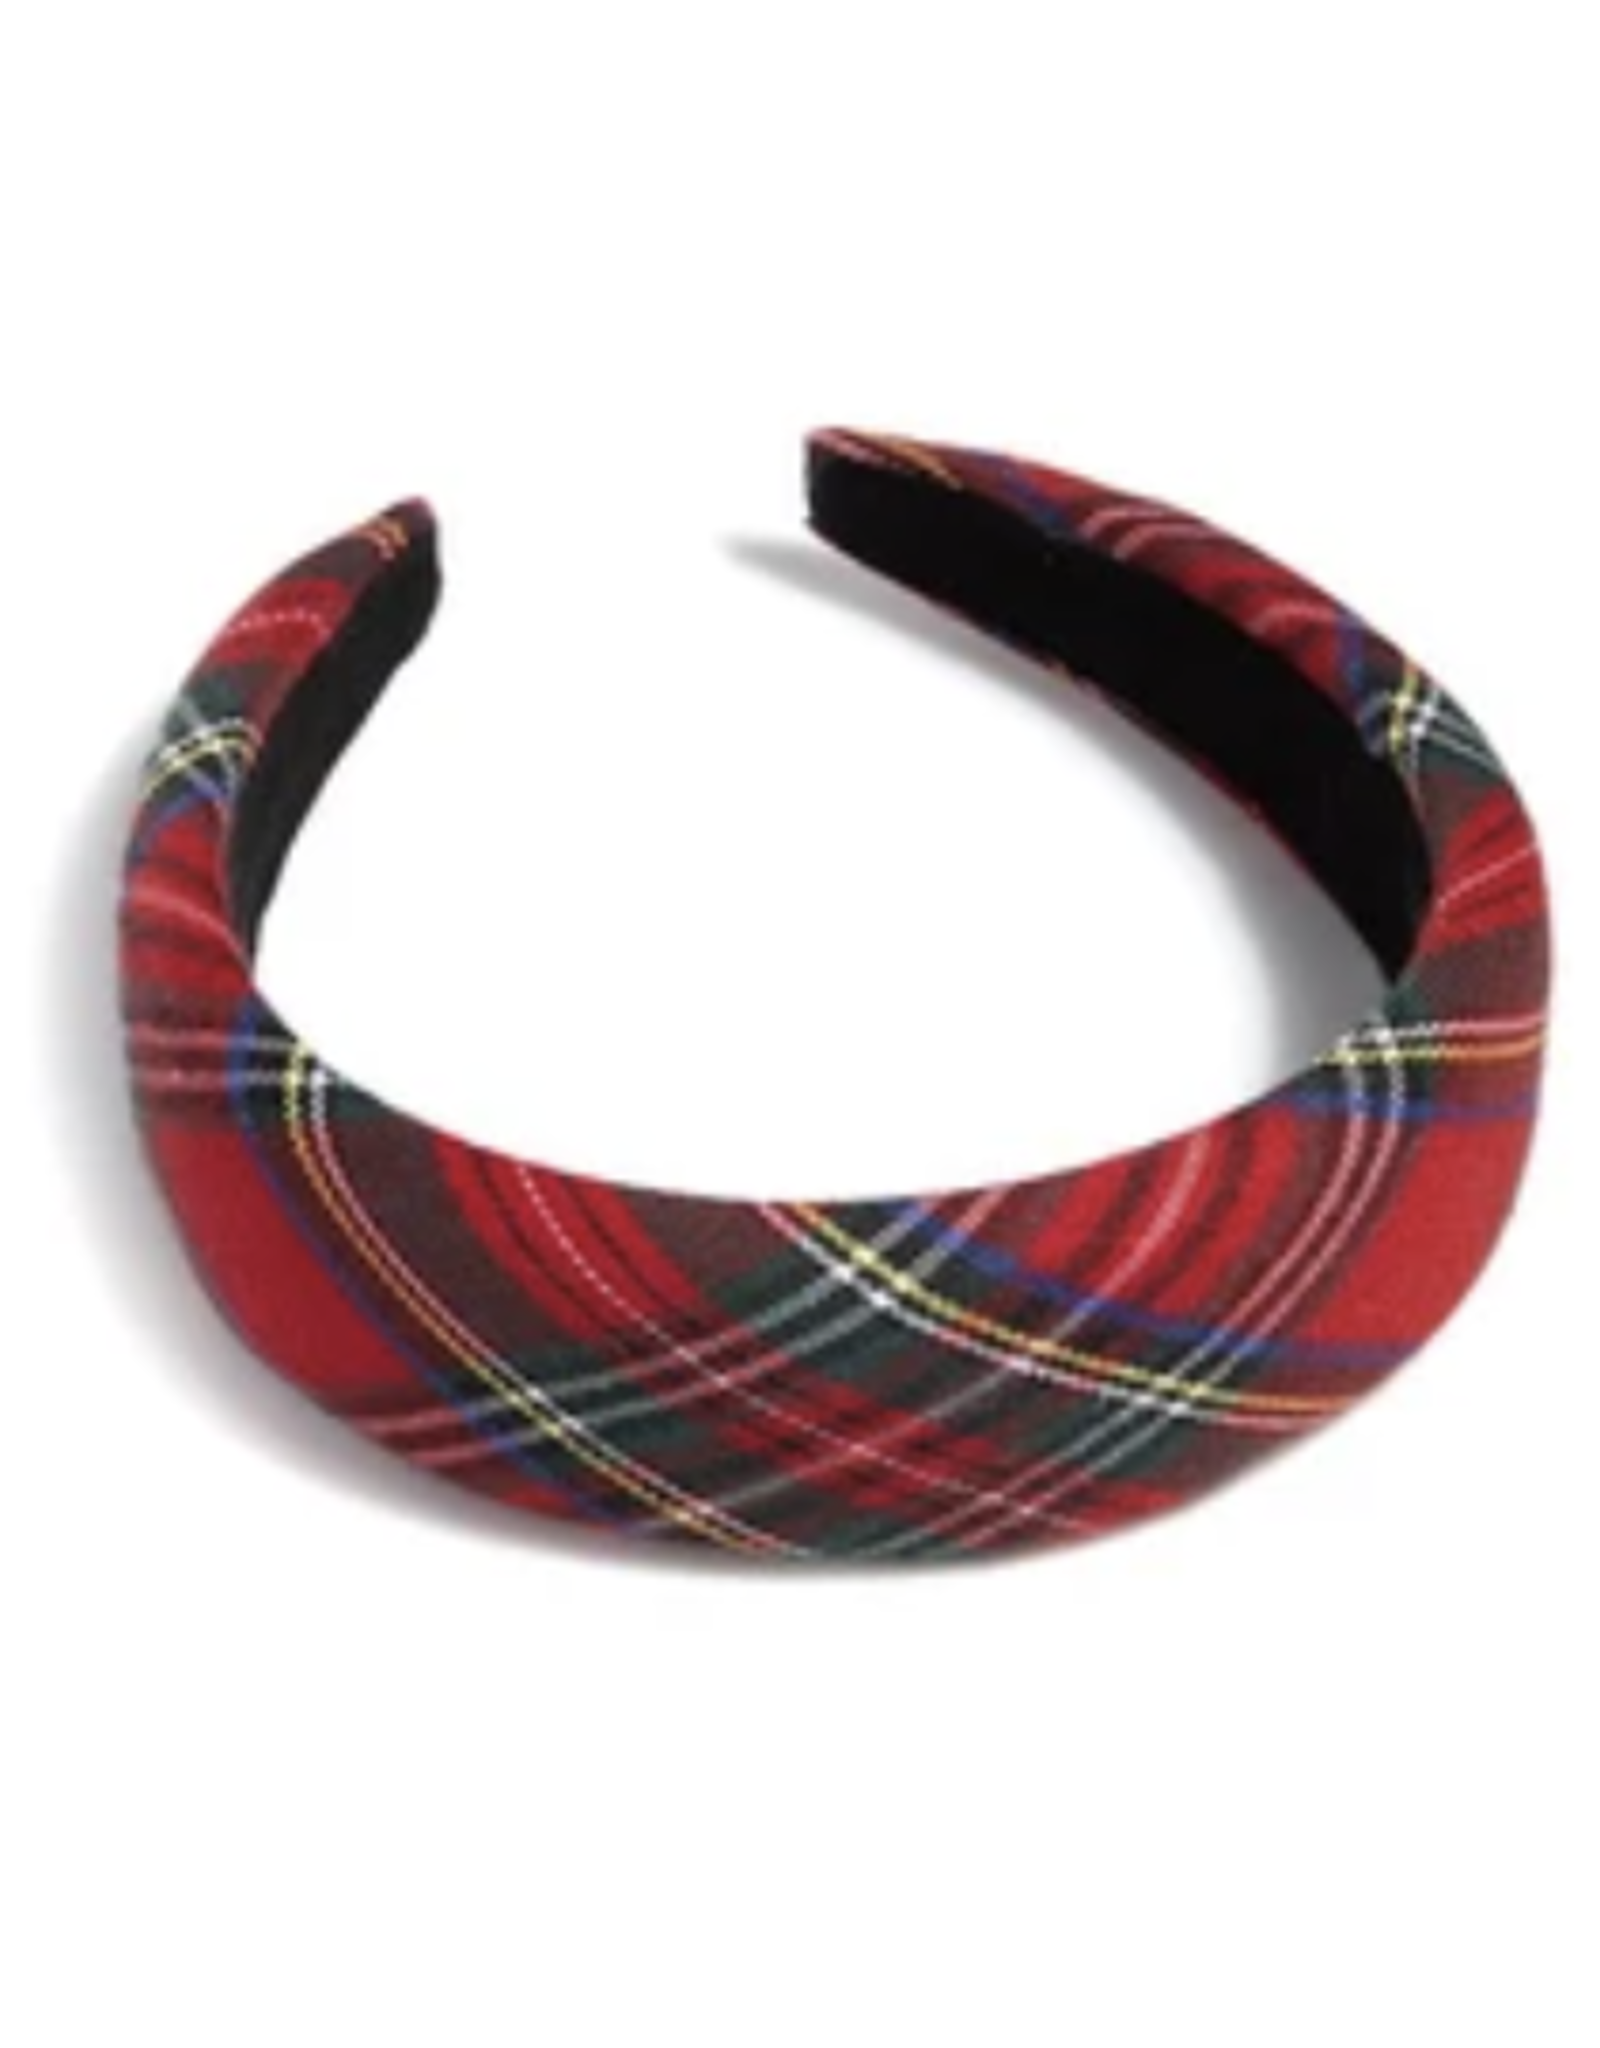 Padded Plaid Headband - Red